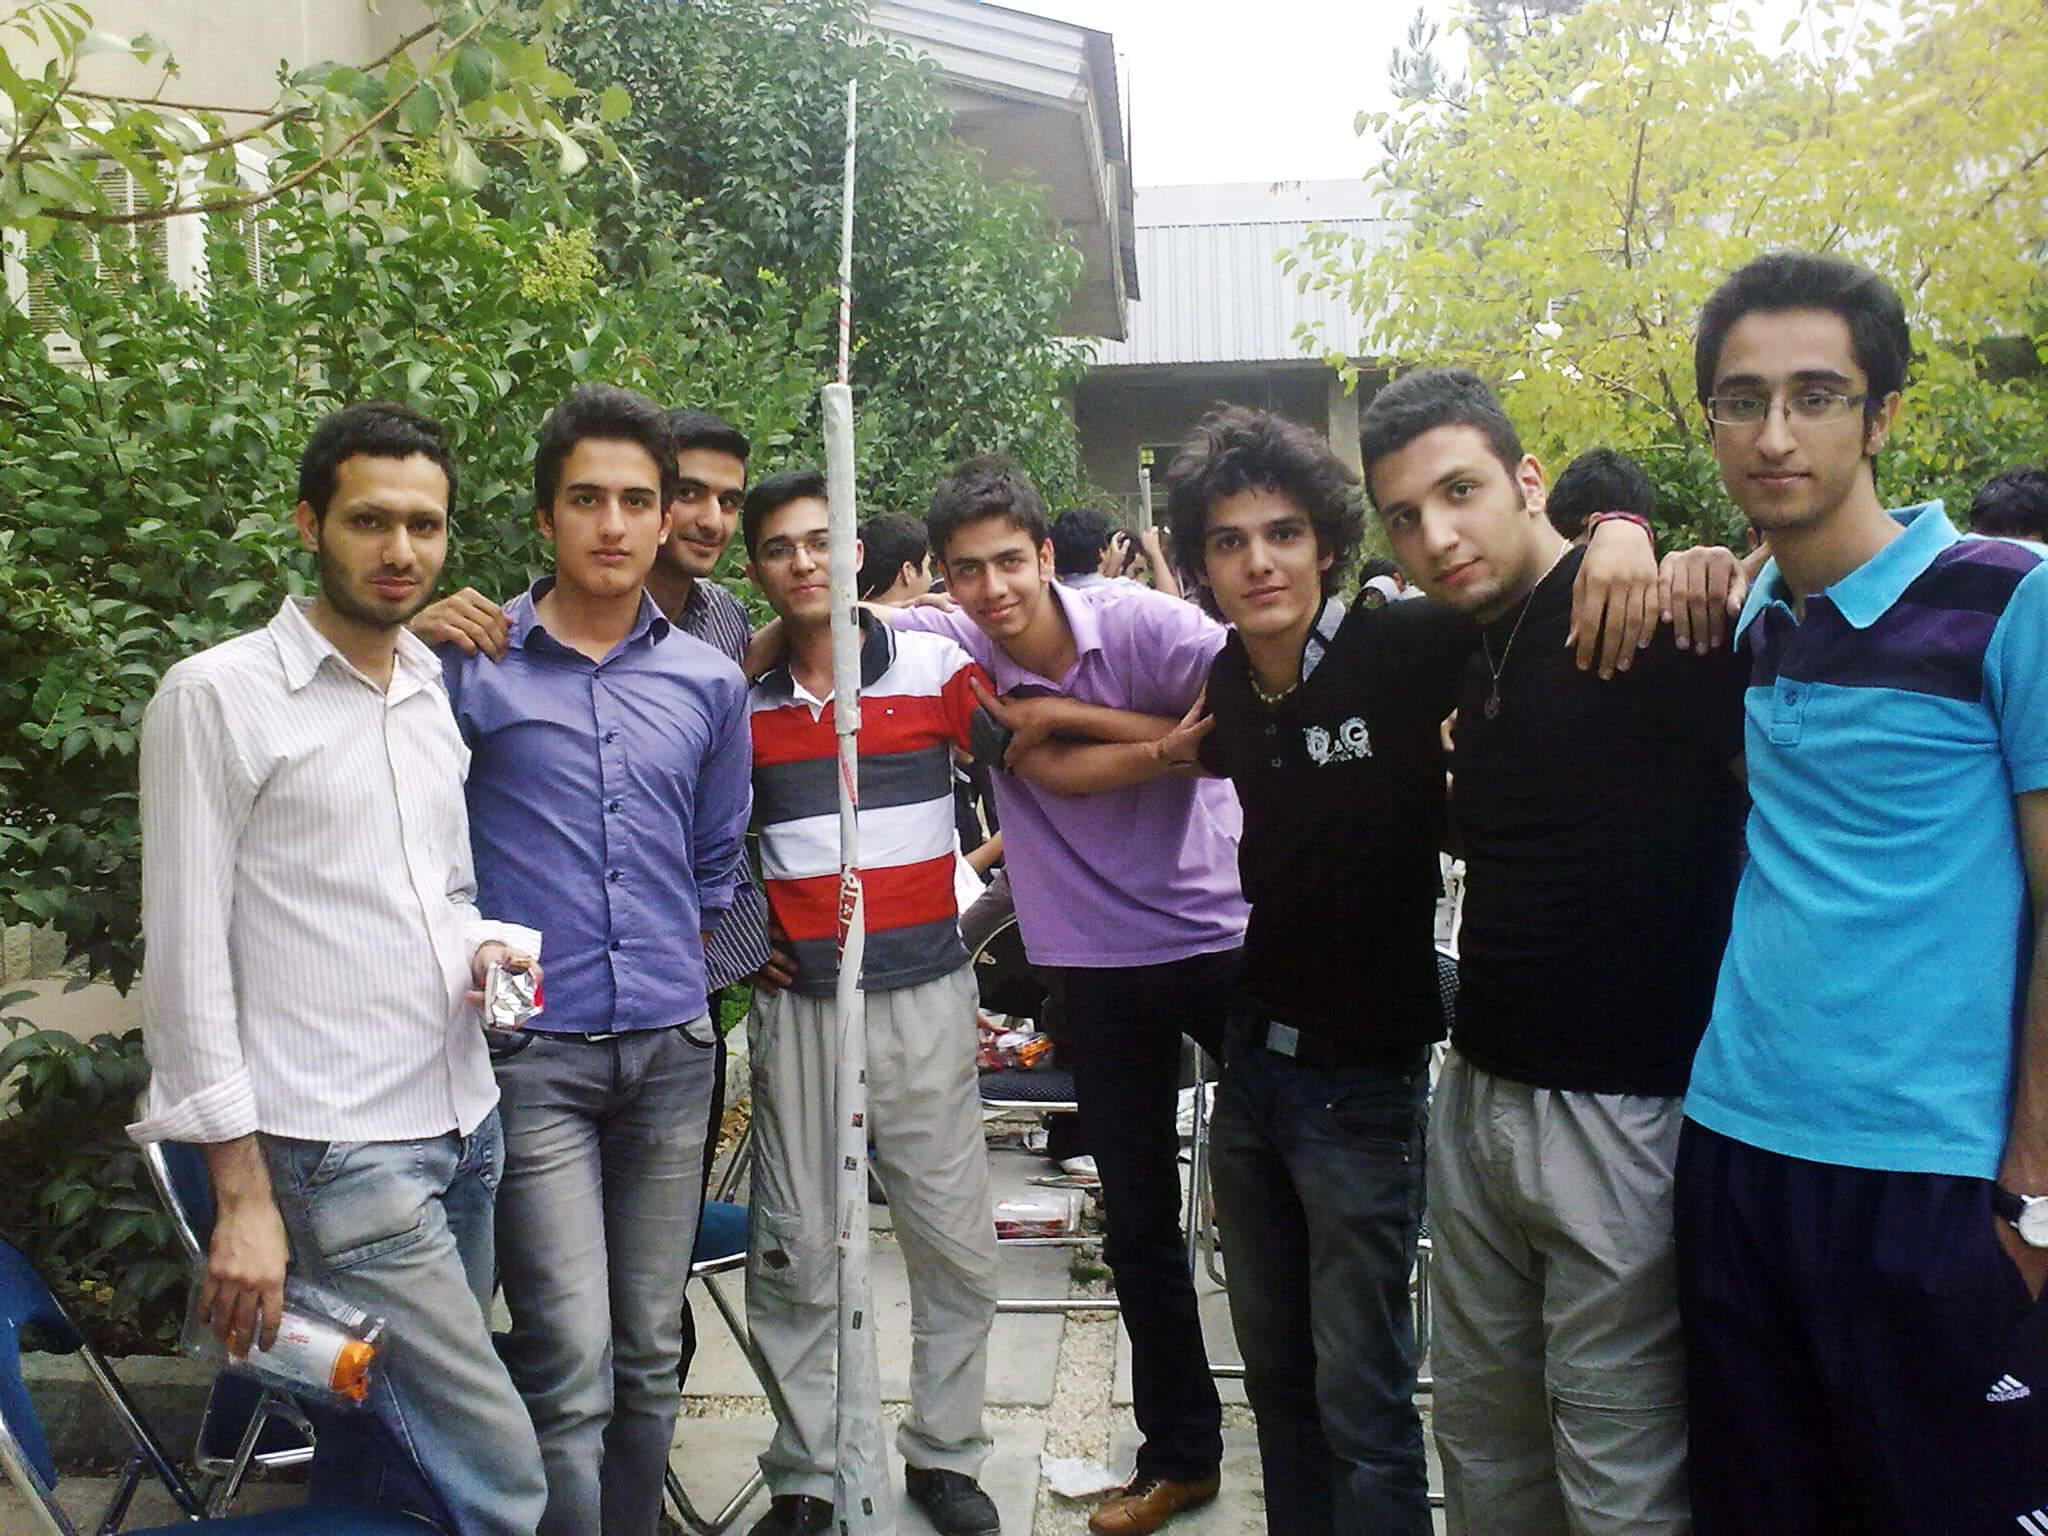 دانشگاه تهران - University of Tehran - newbie project